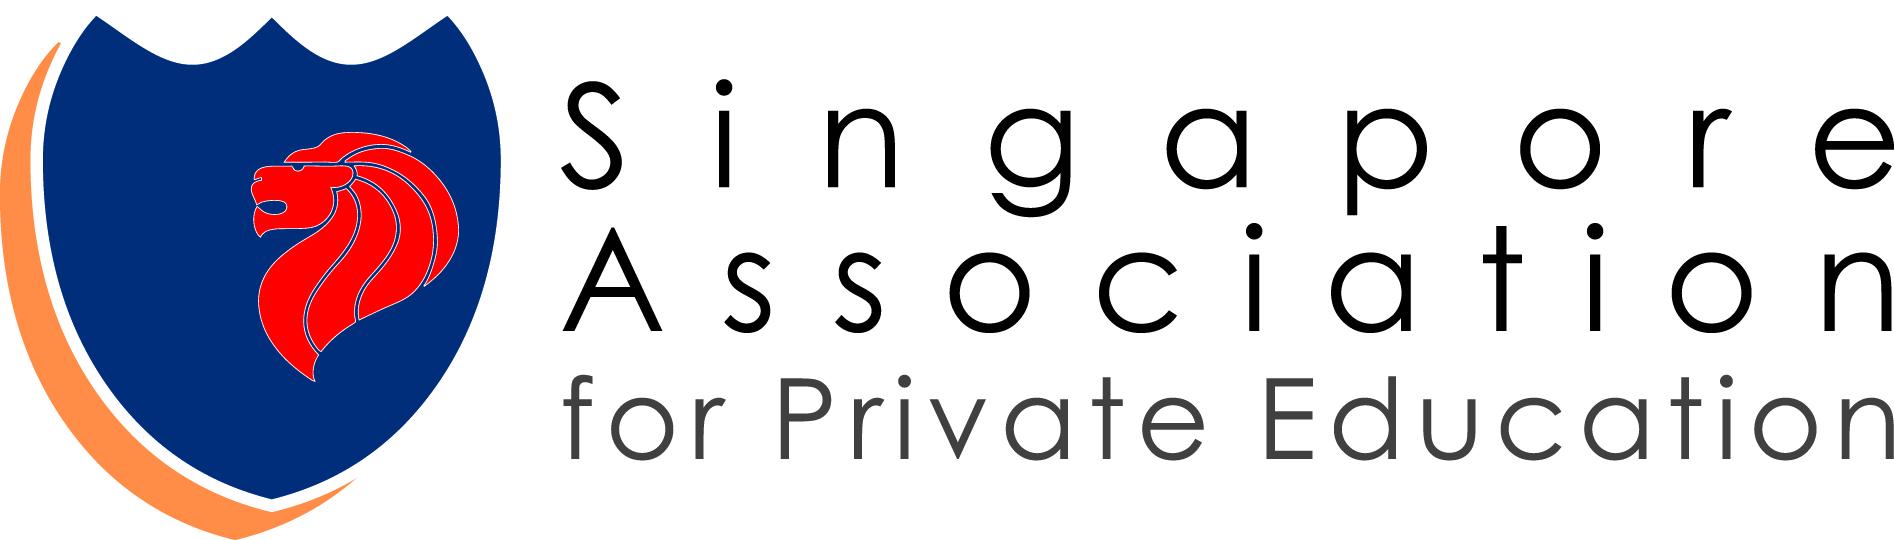 Singapore Association for Private Education (SAPE)